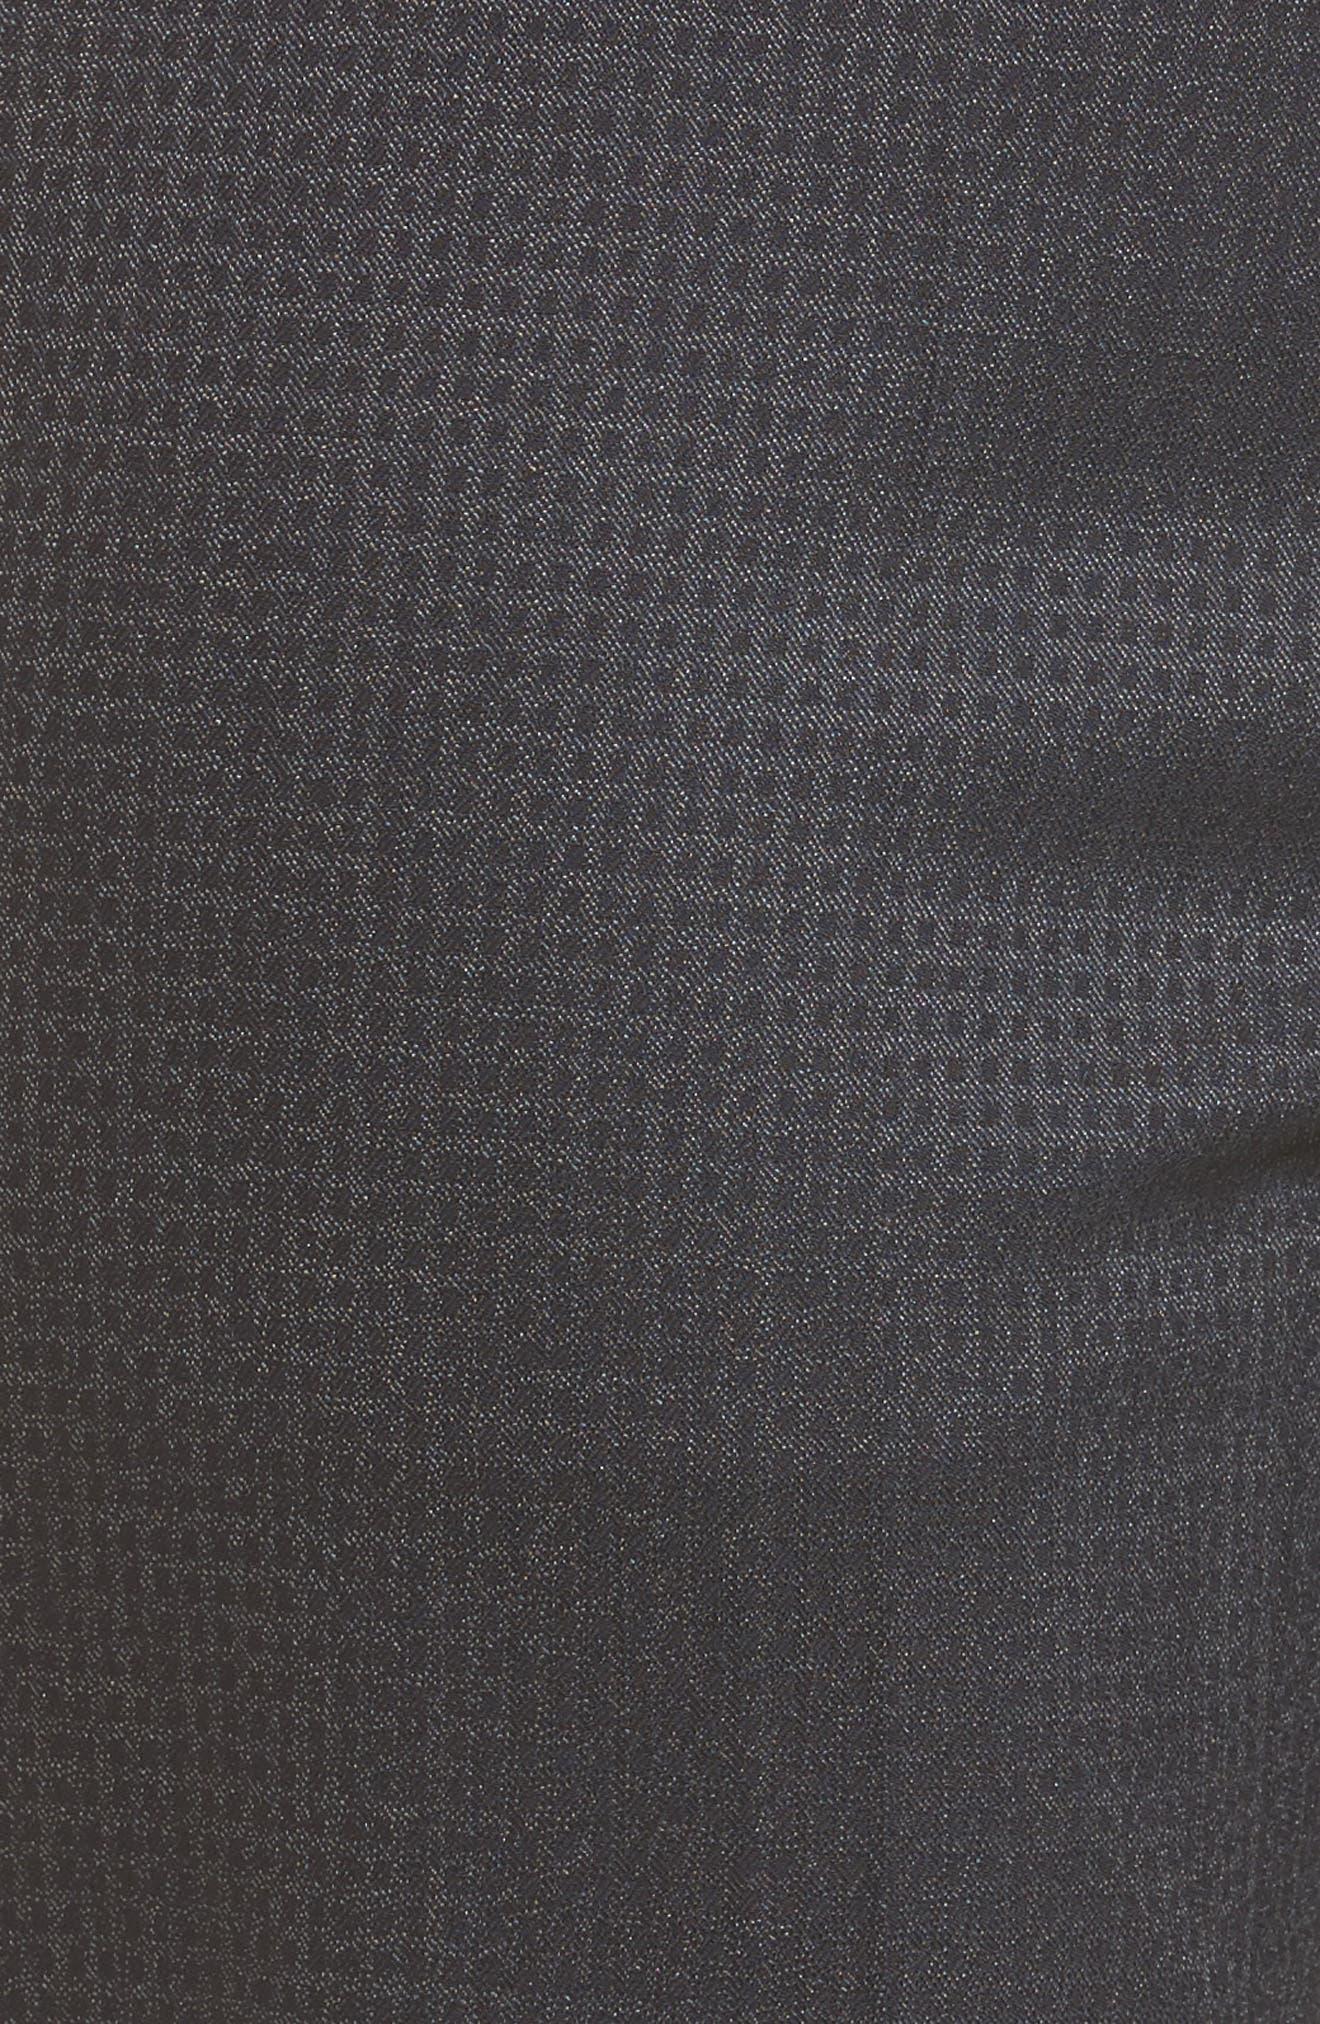 Tamea Stretch Wool Straight Leg Trousers,                             Alternate thumbnail 5, color,